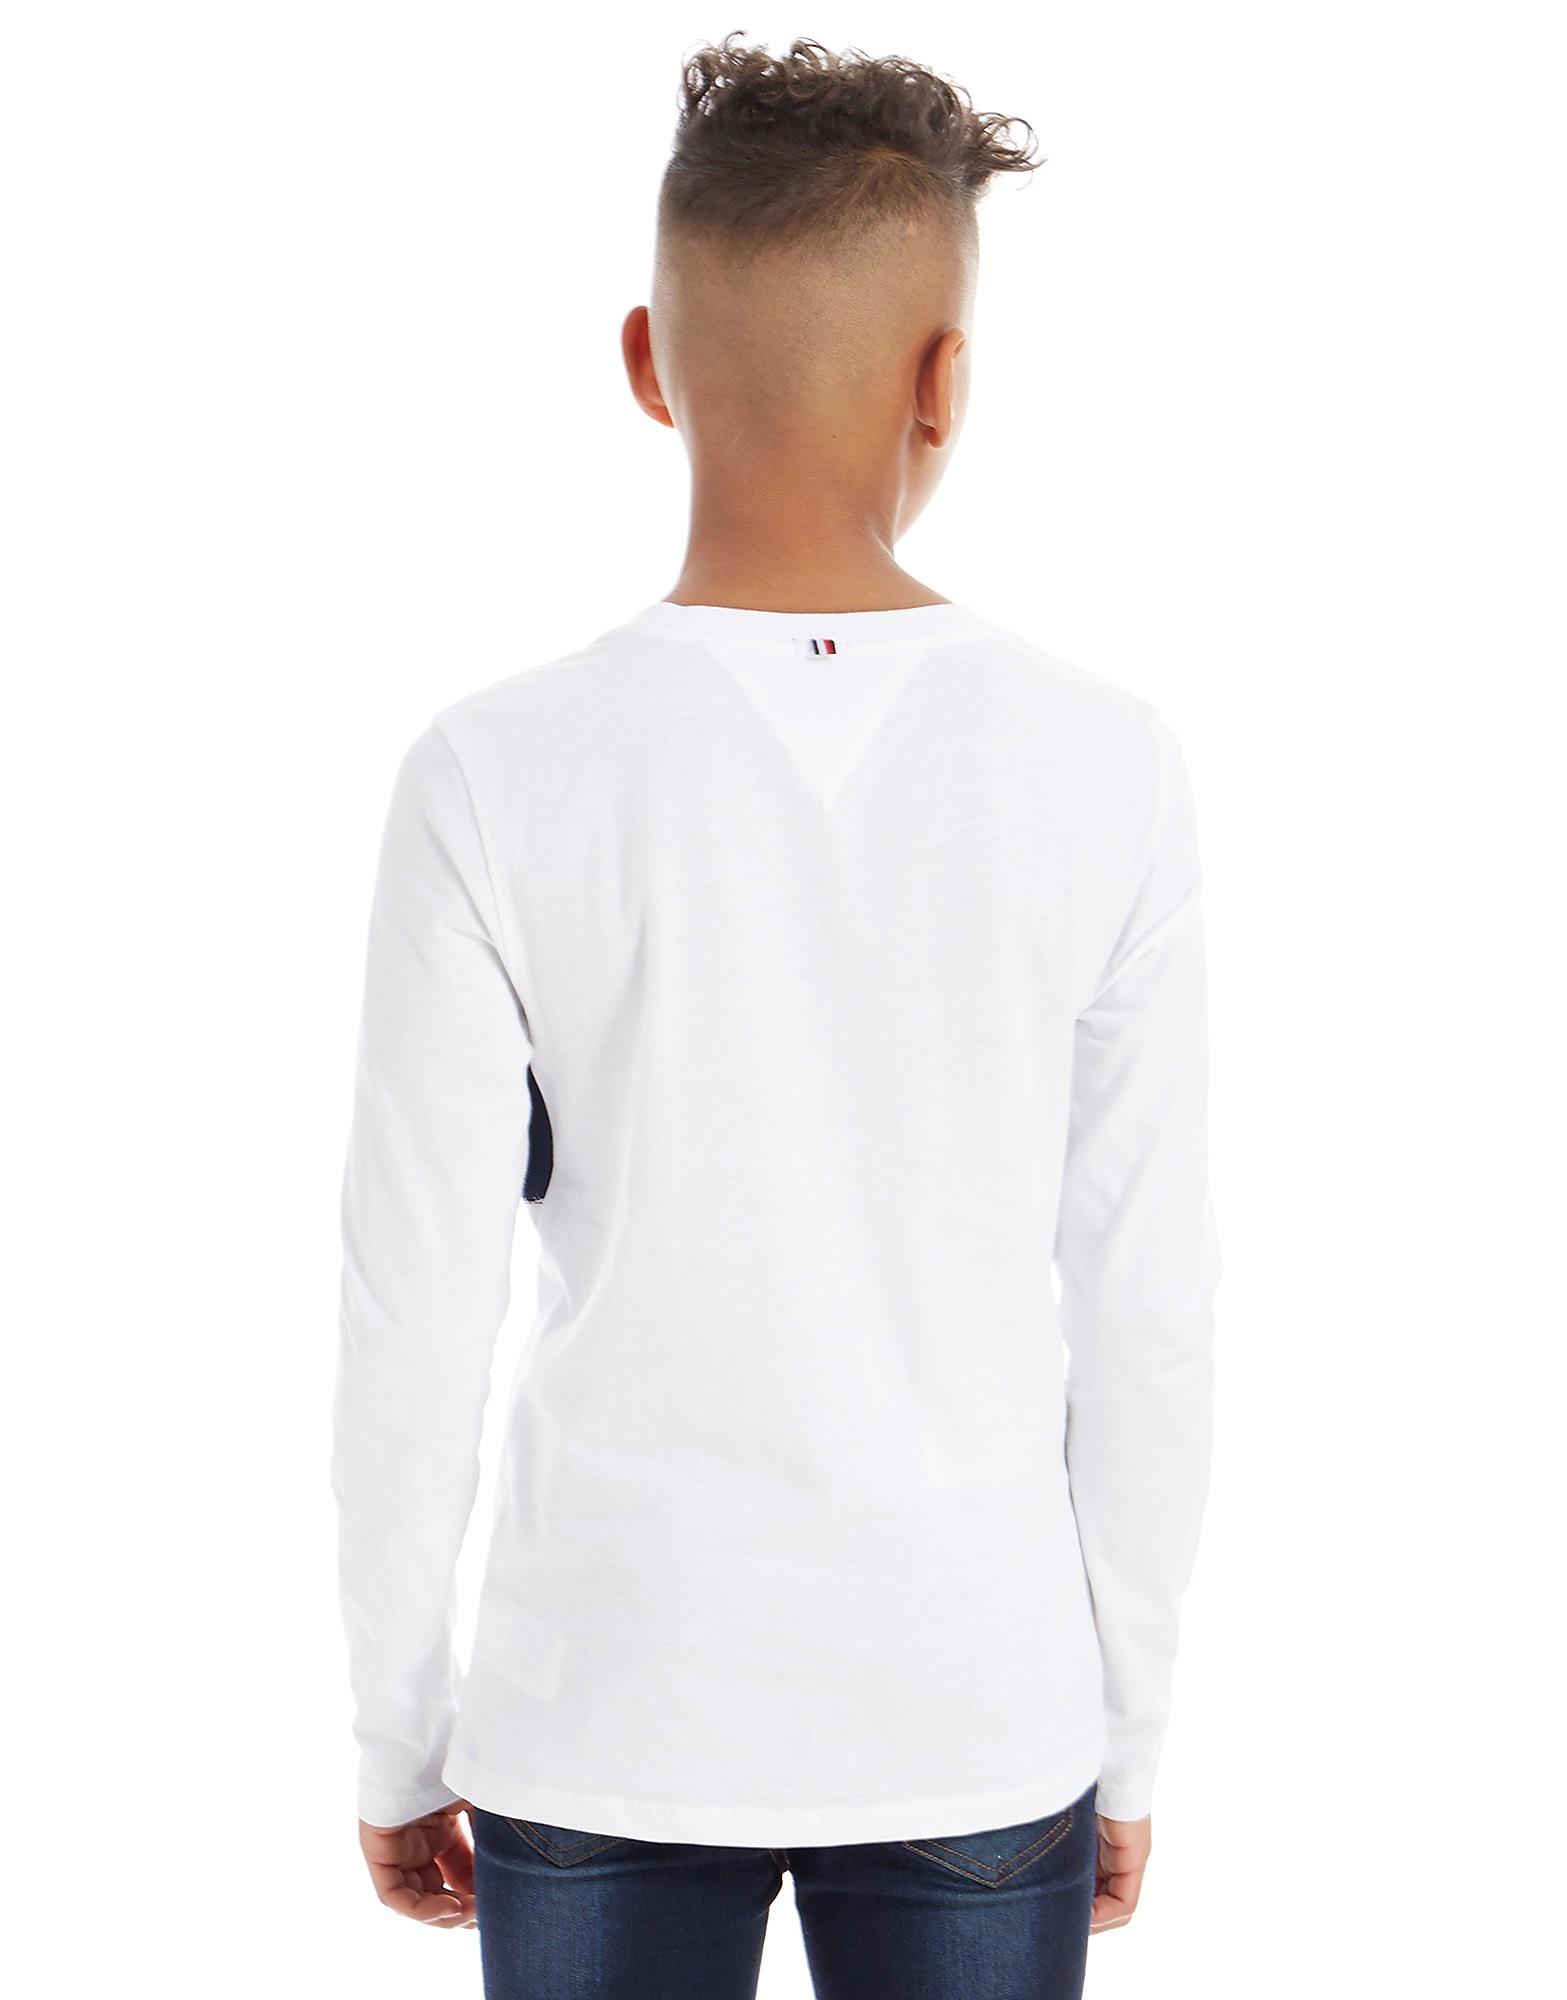 Tommy Hilfiger Long Sleeve Colourblock T-Shirt Junior